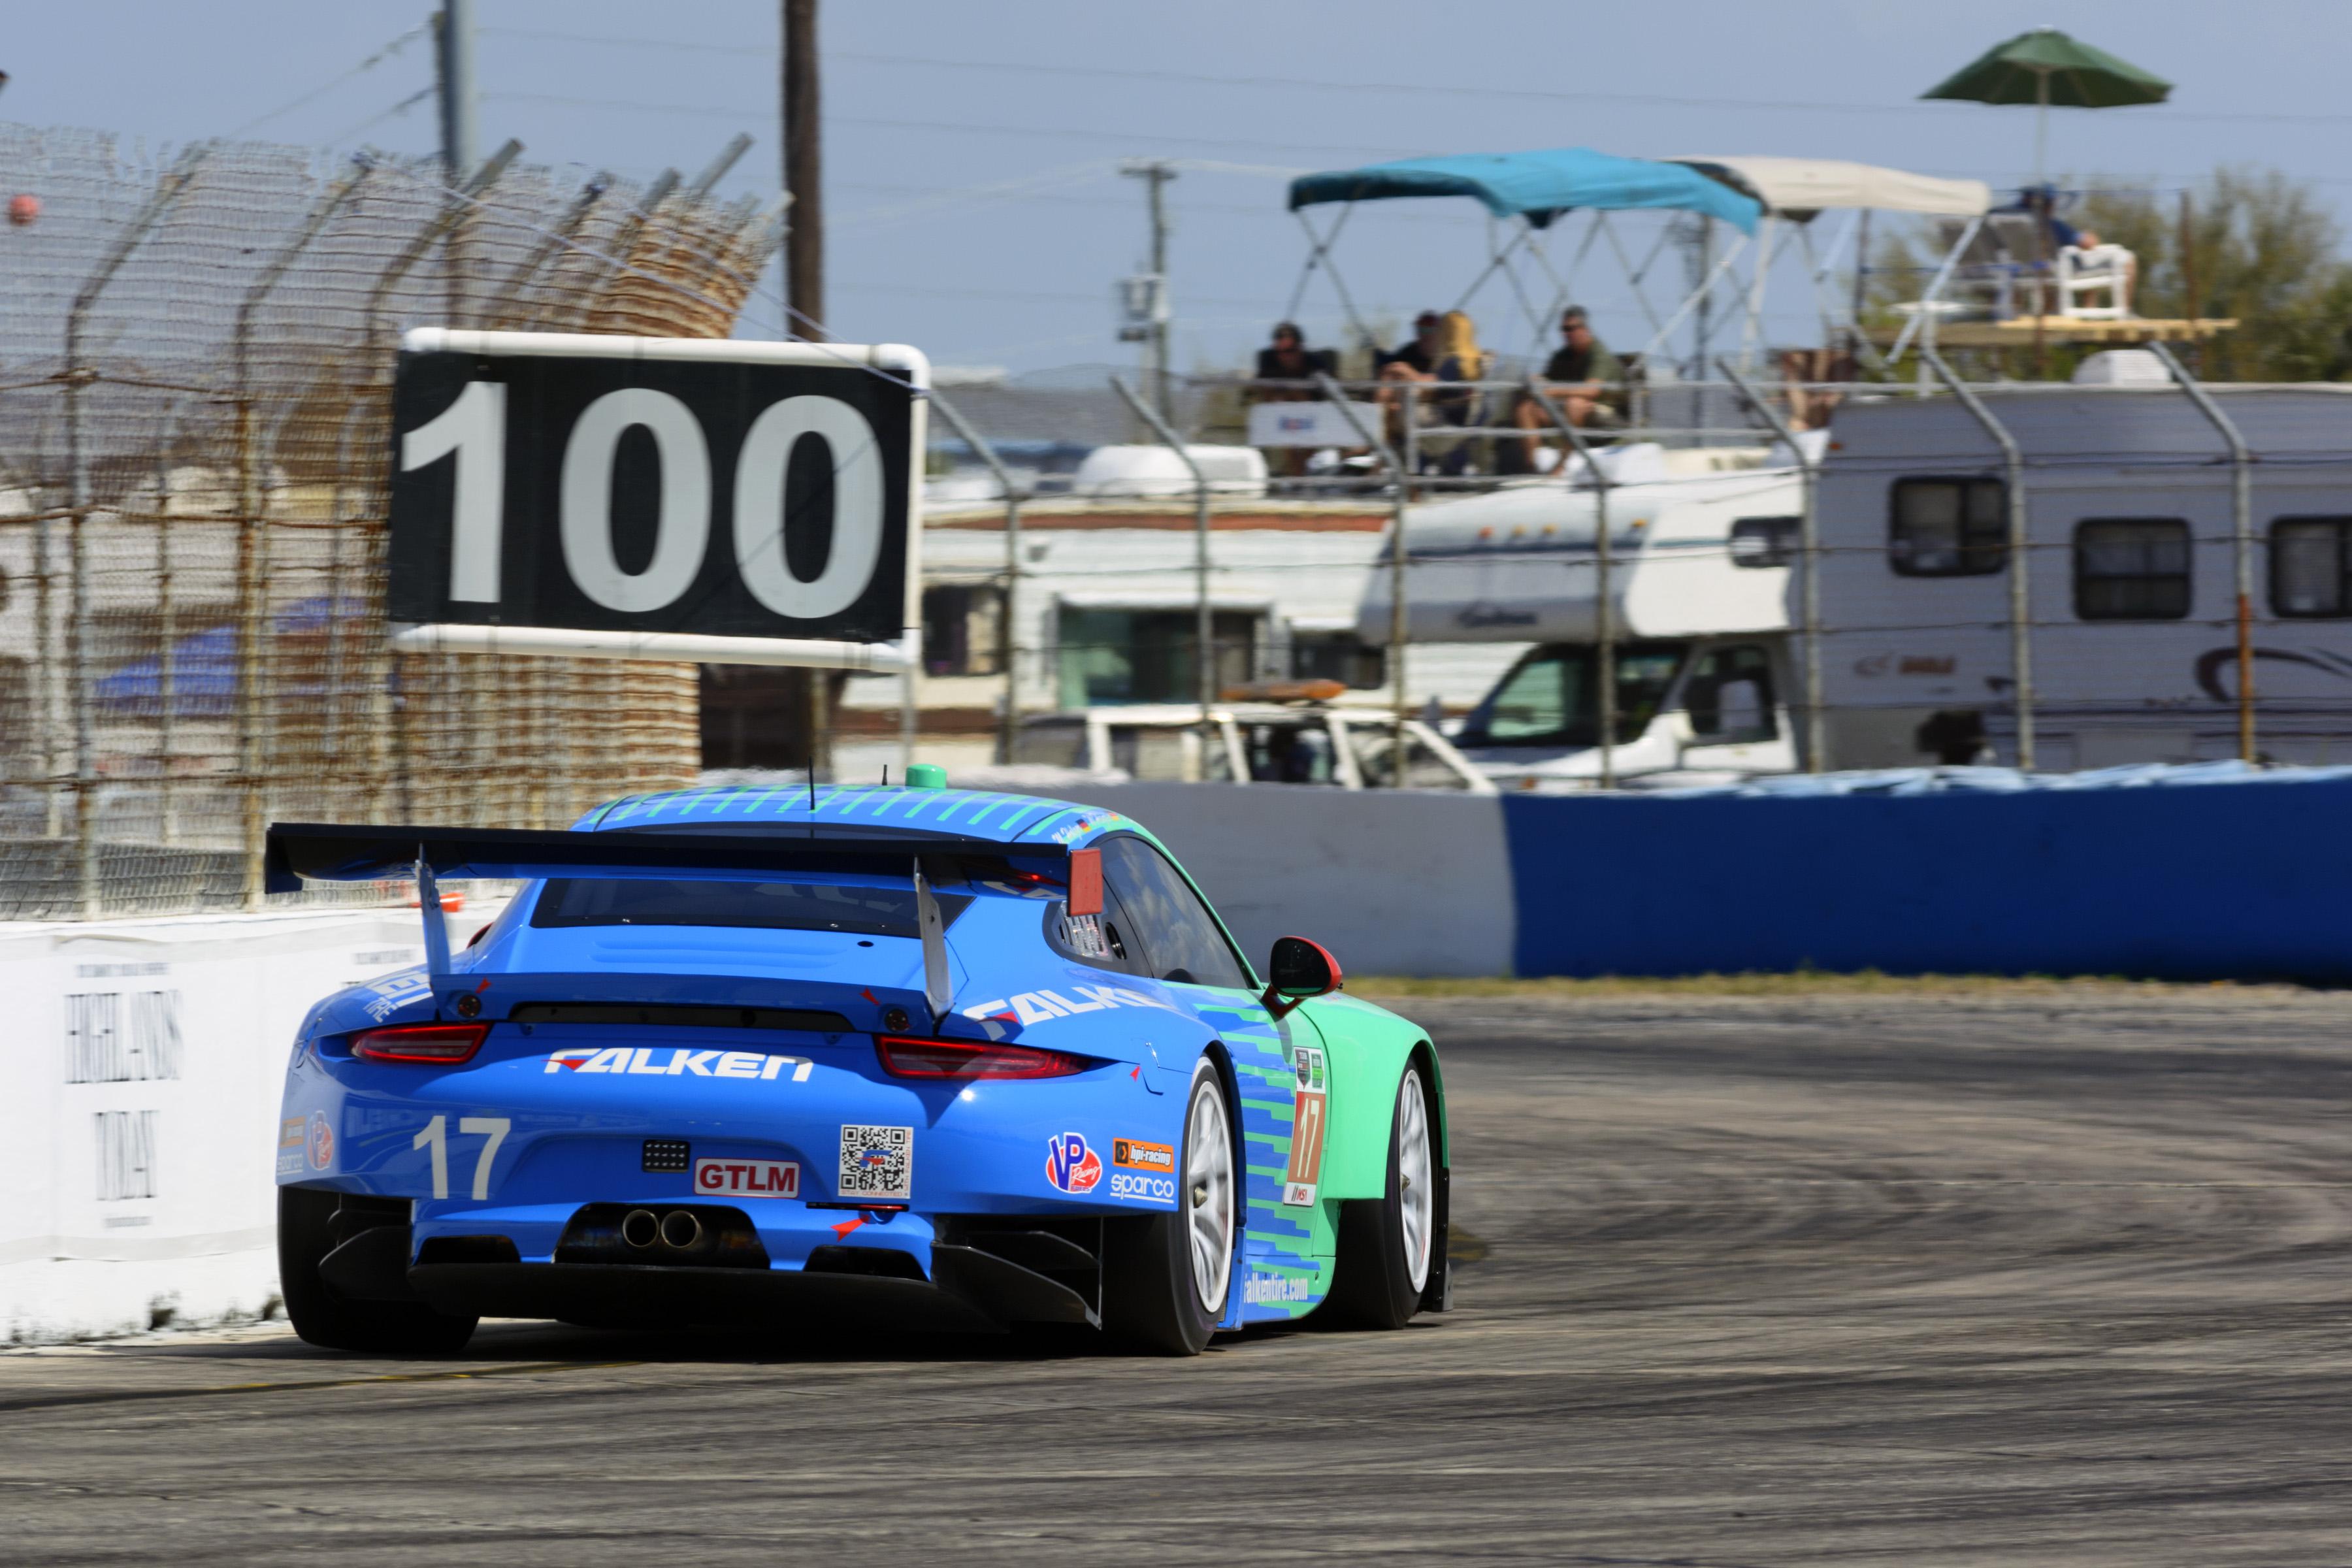 m15_0145_fine Inspiring Porsche 911 Gt1 Road atlanta Cars Trend